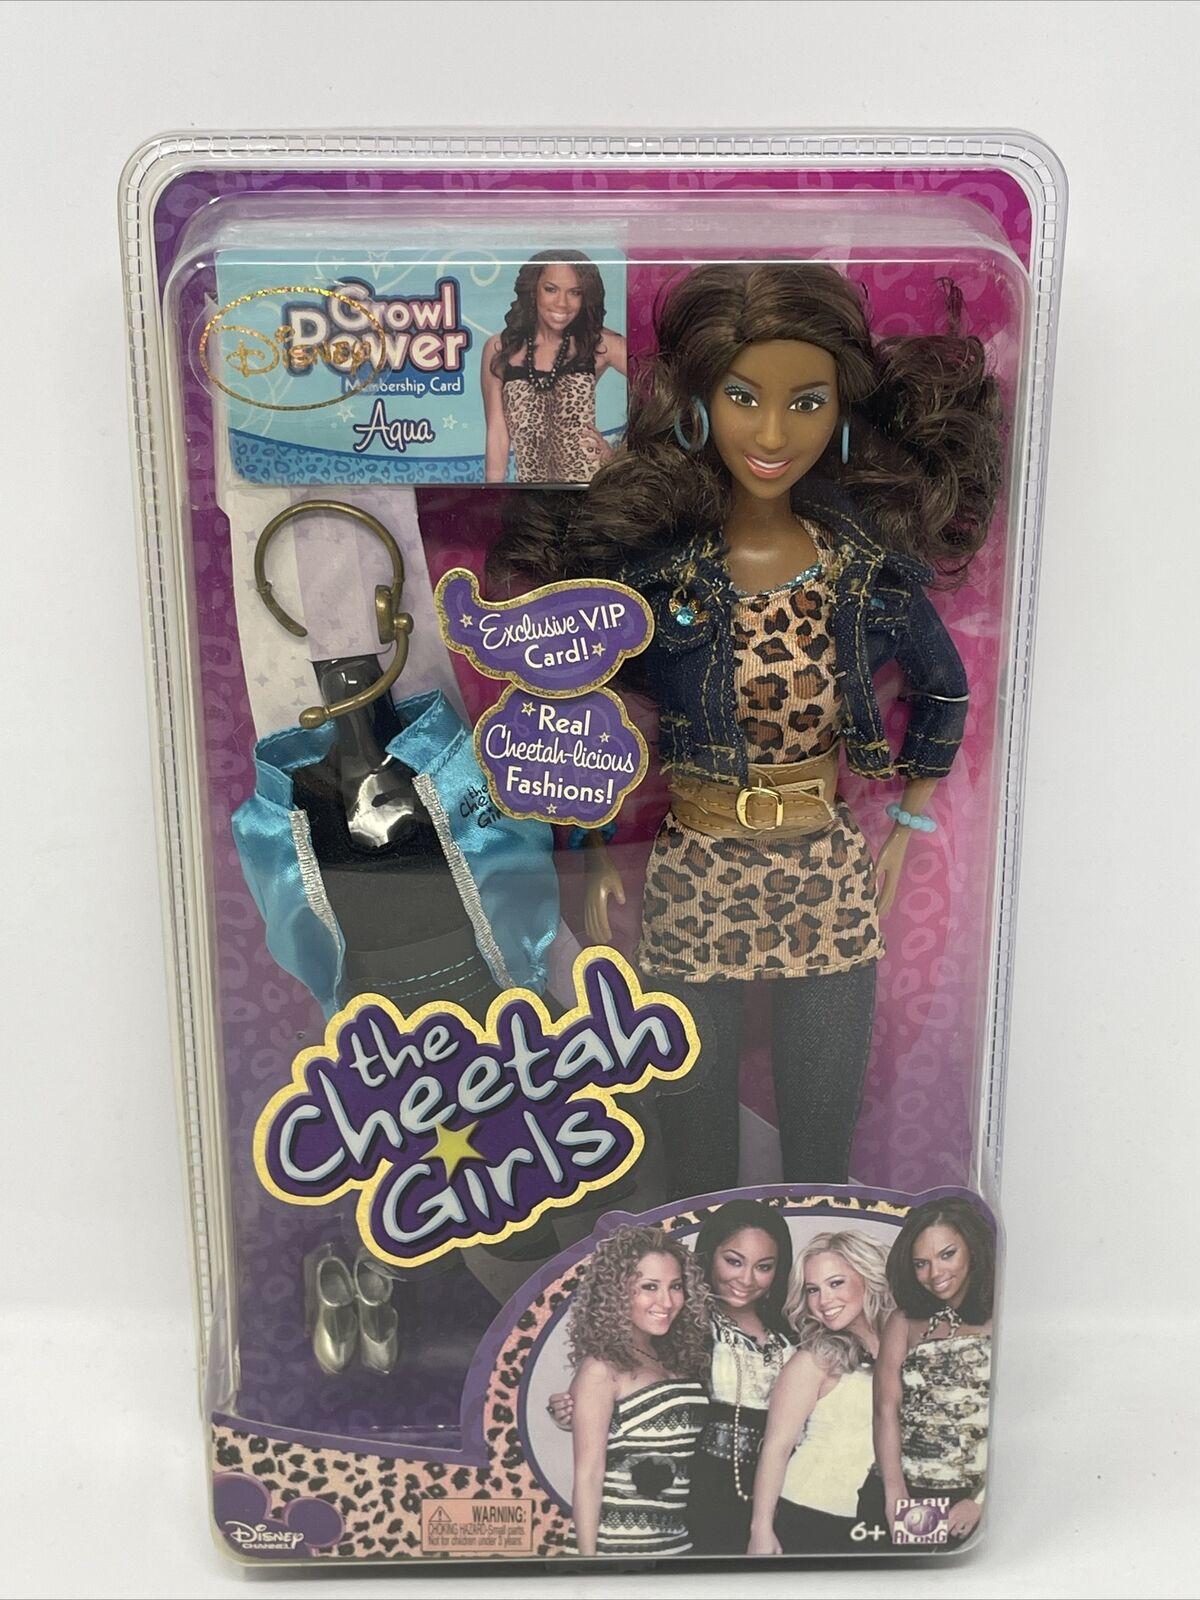 2007 Disney The Cheetah Girls Doll Aqua for sale online